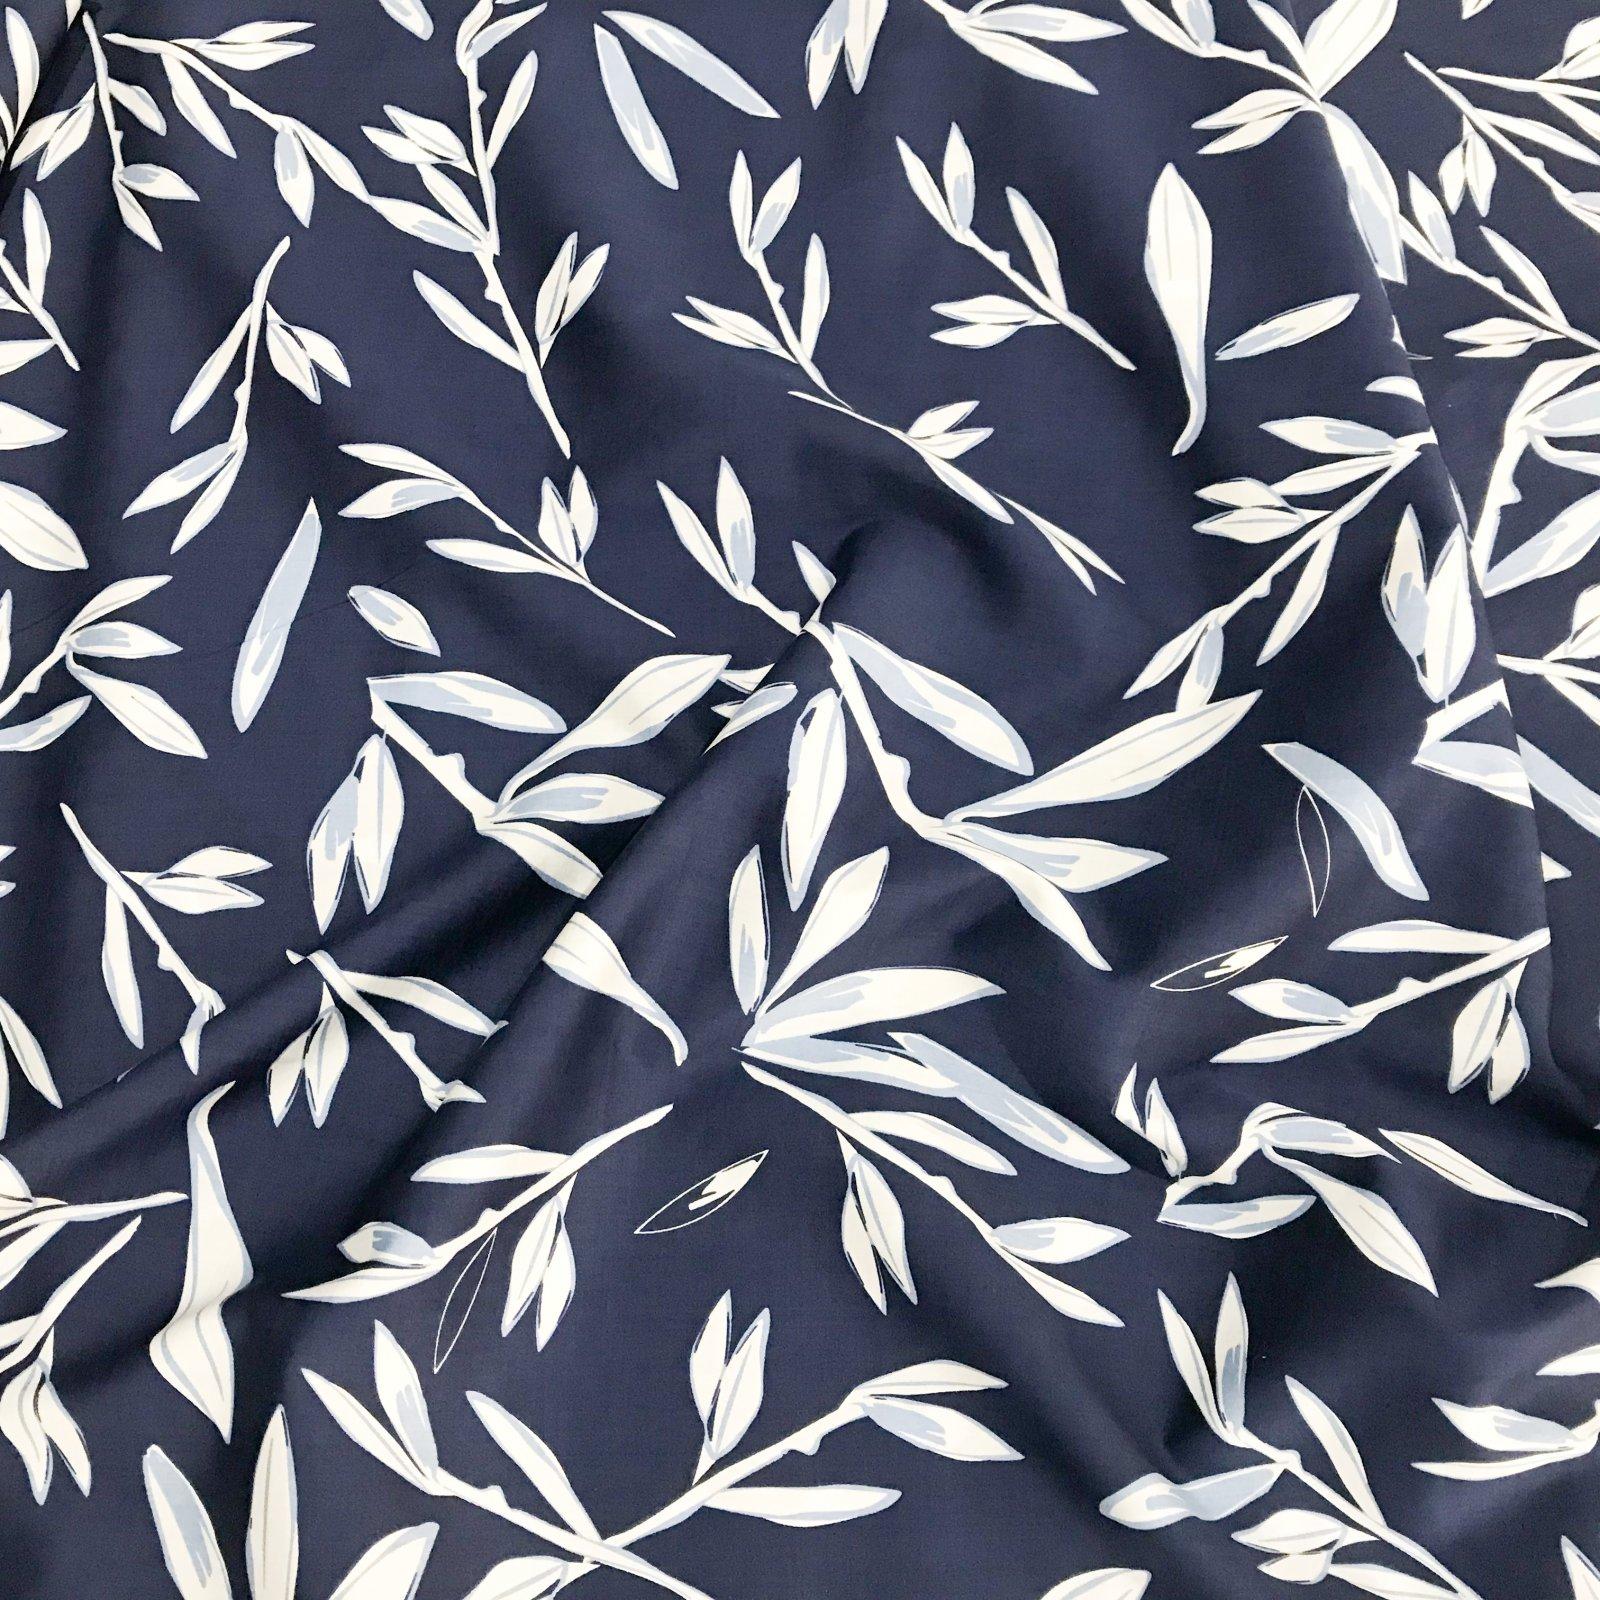 Cotton - Japanese Leaf Satin